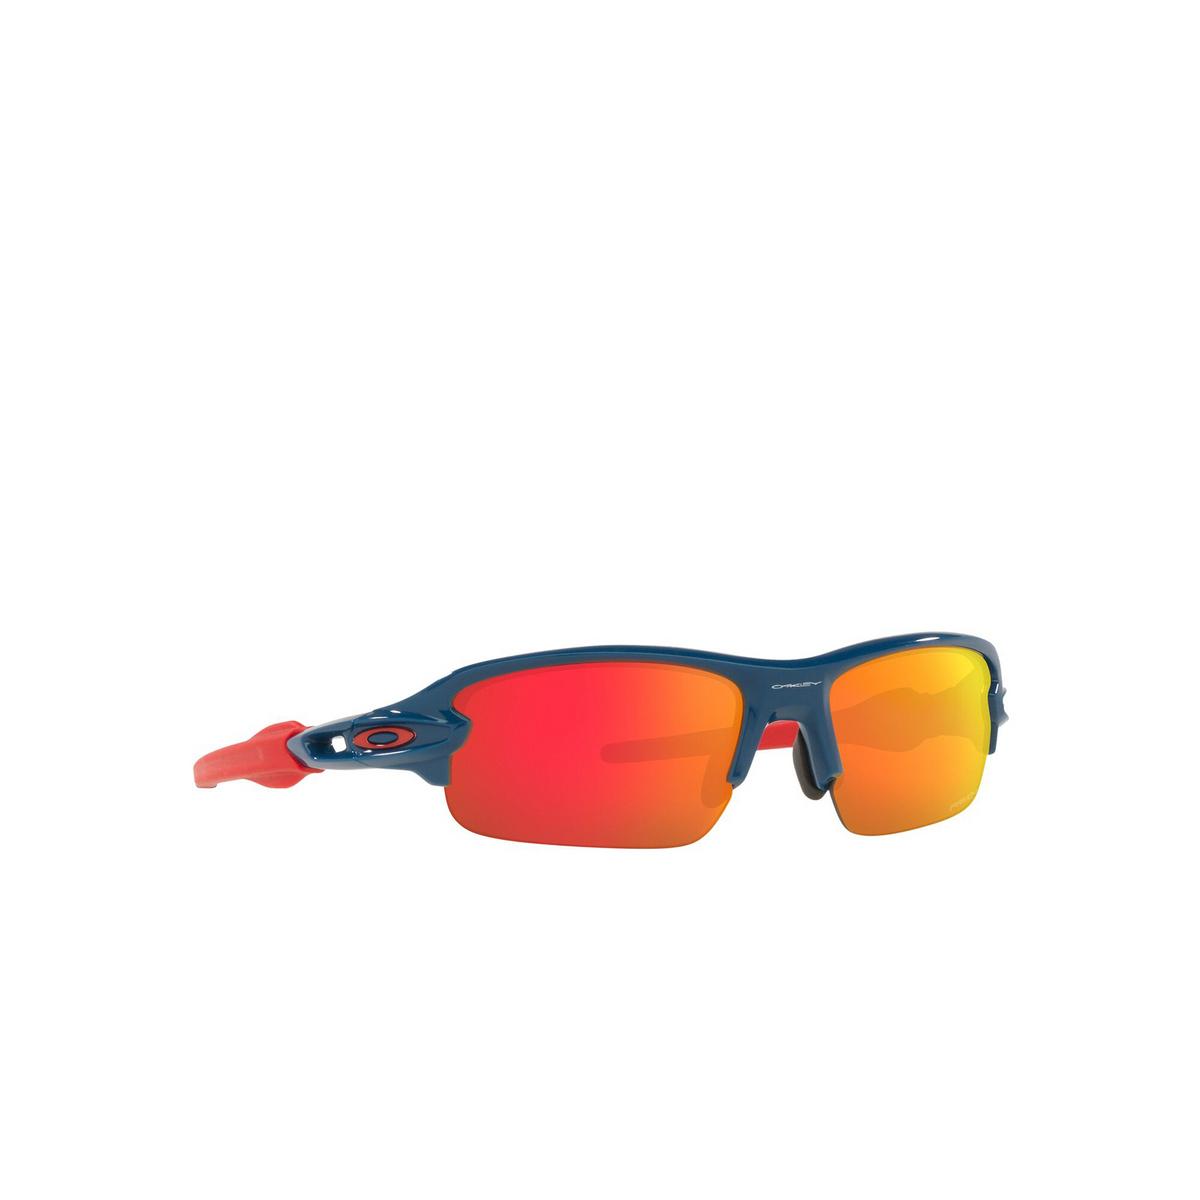 Oakley® Rectangle Sunglasses: Flak Xxs OJ9008 color Poseidon 900803 - three-quarters view.